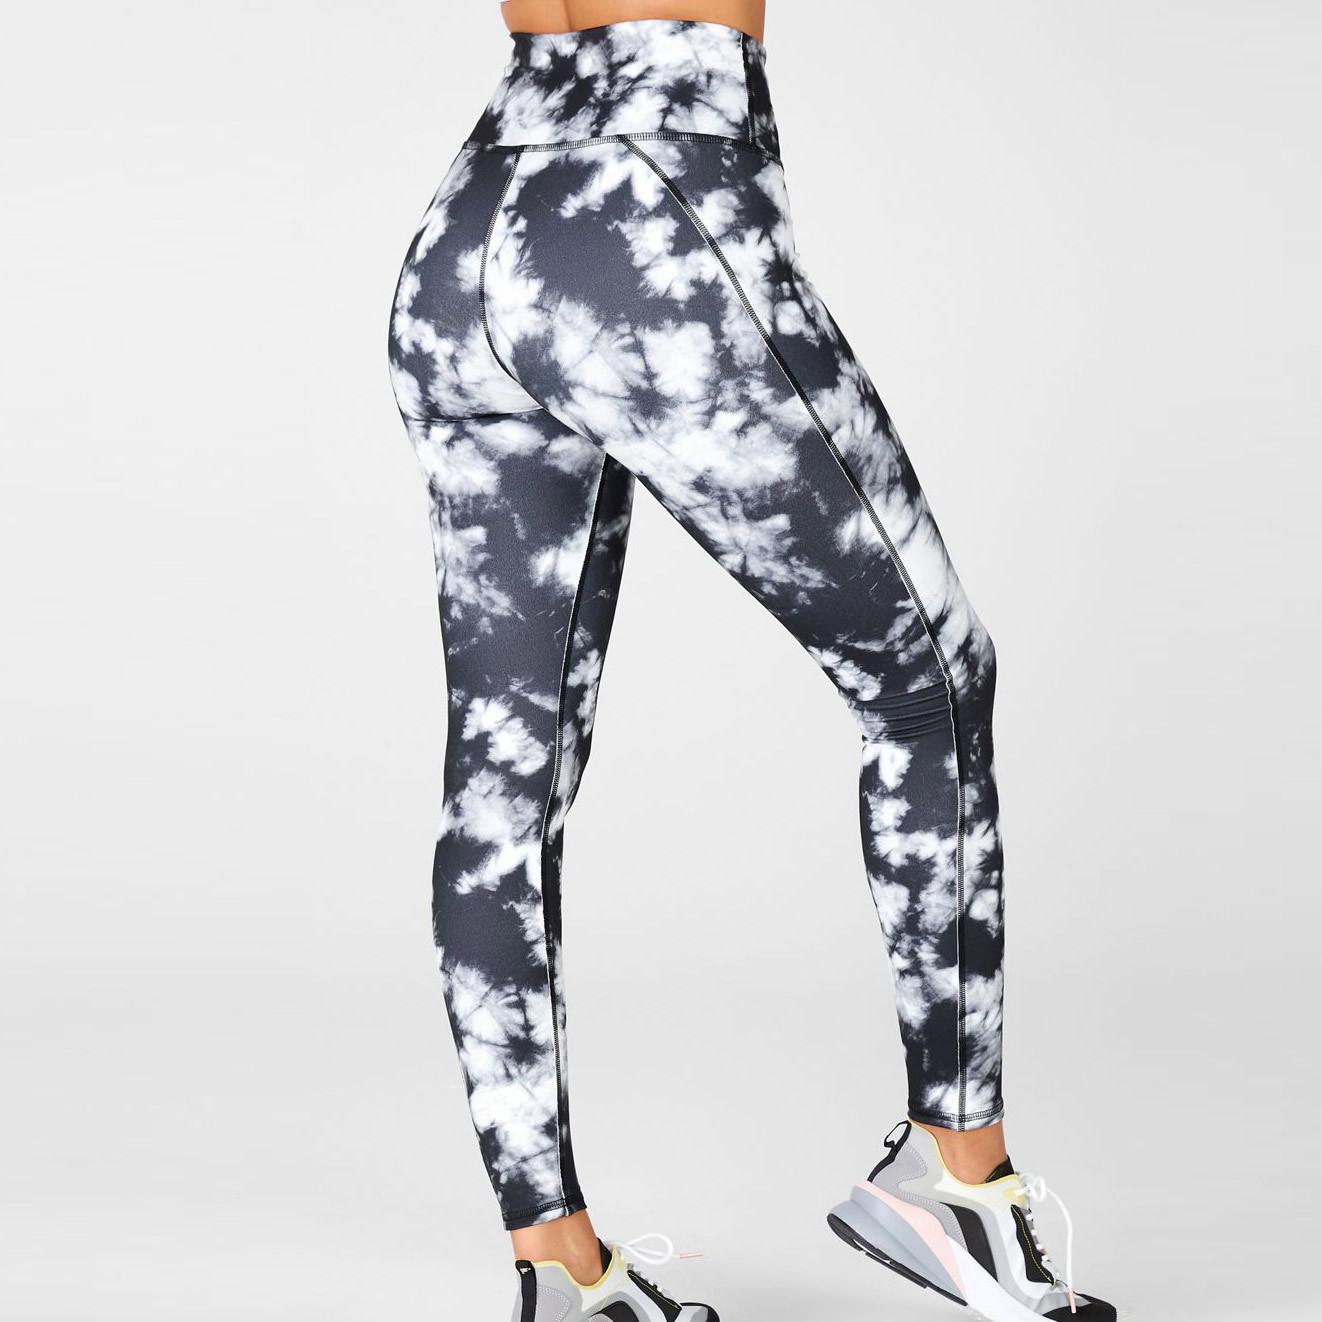 wholesale printed leggings